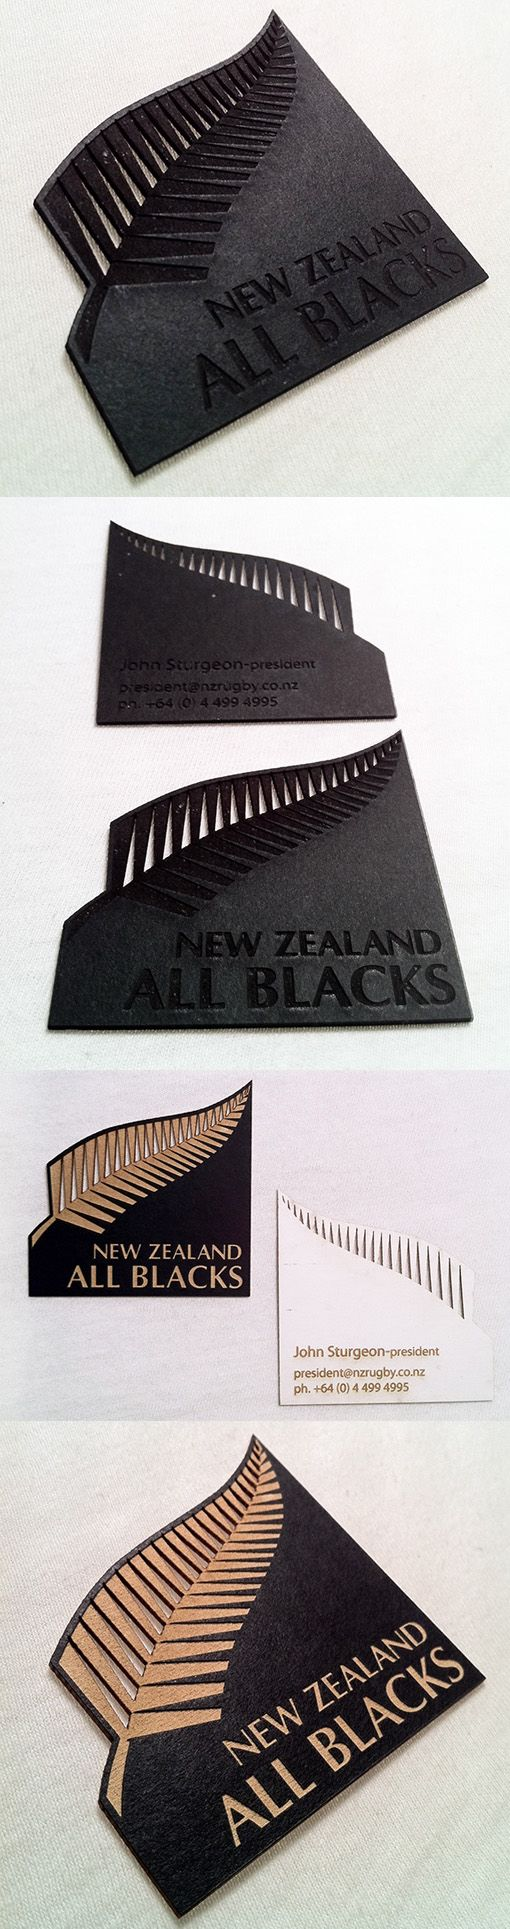 Pin On Graphic Design Stuff